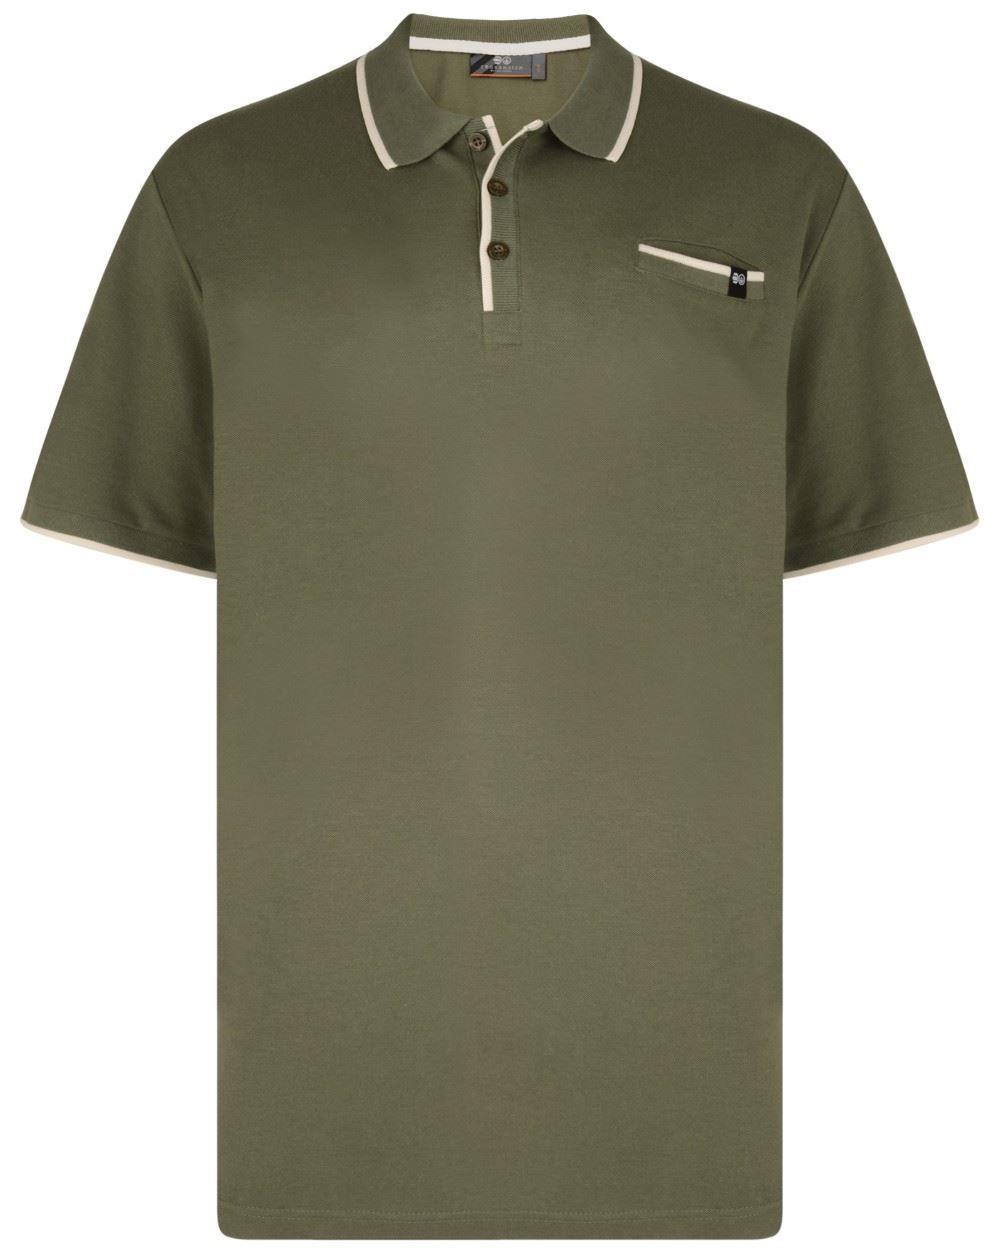 Crosshatch Resernate Polo Shirt - Khaki|6XL